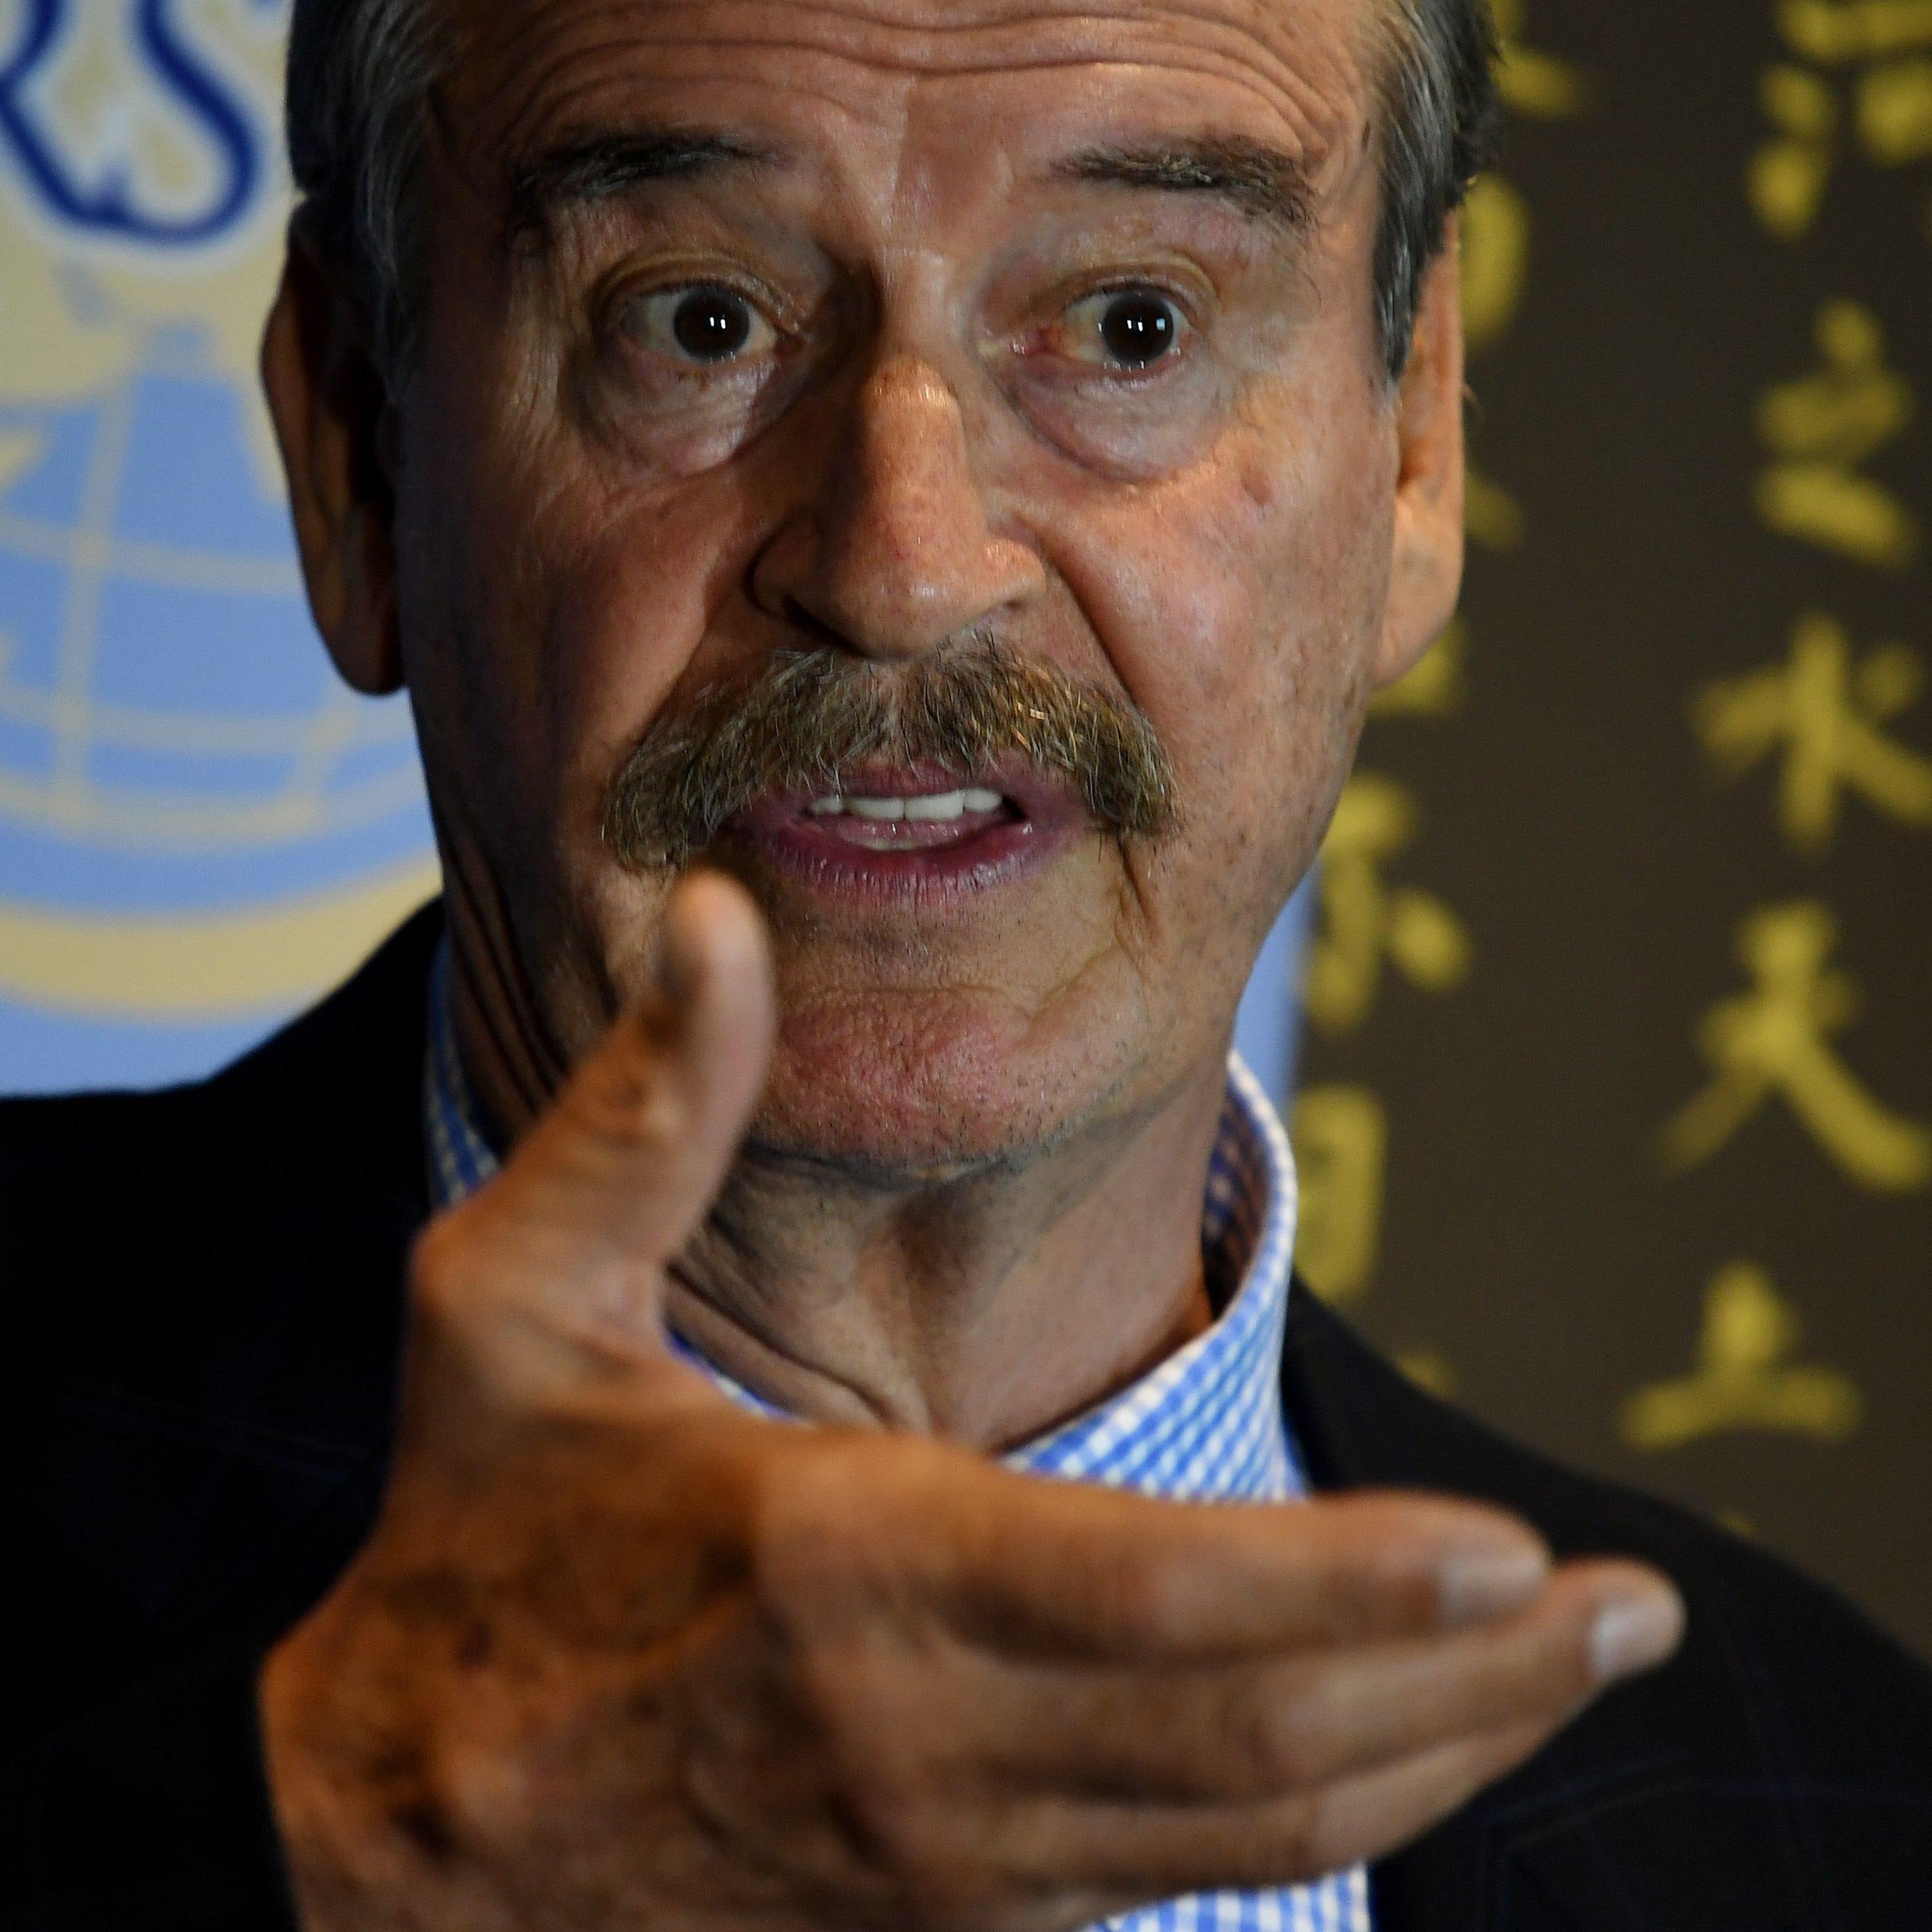 Vicente Fox afirma que grupo armado allanó su casa